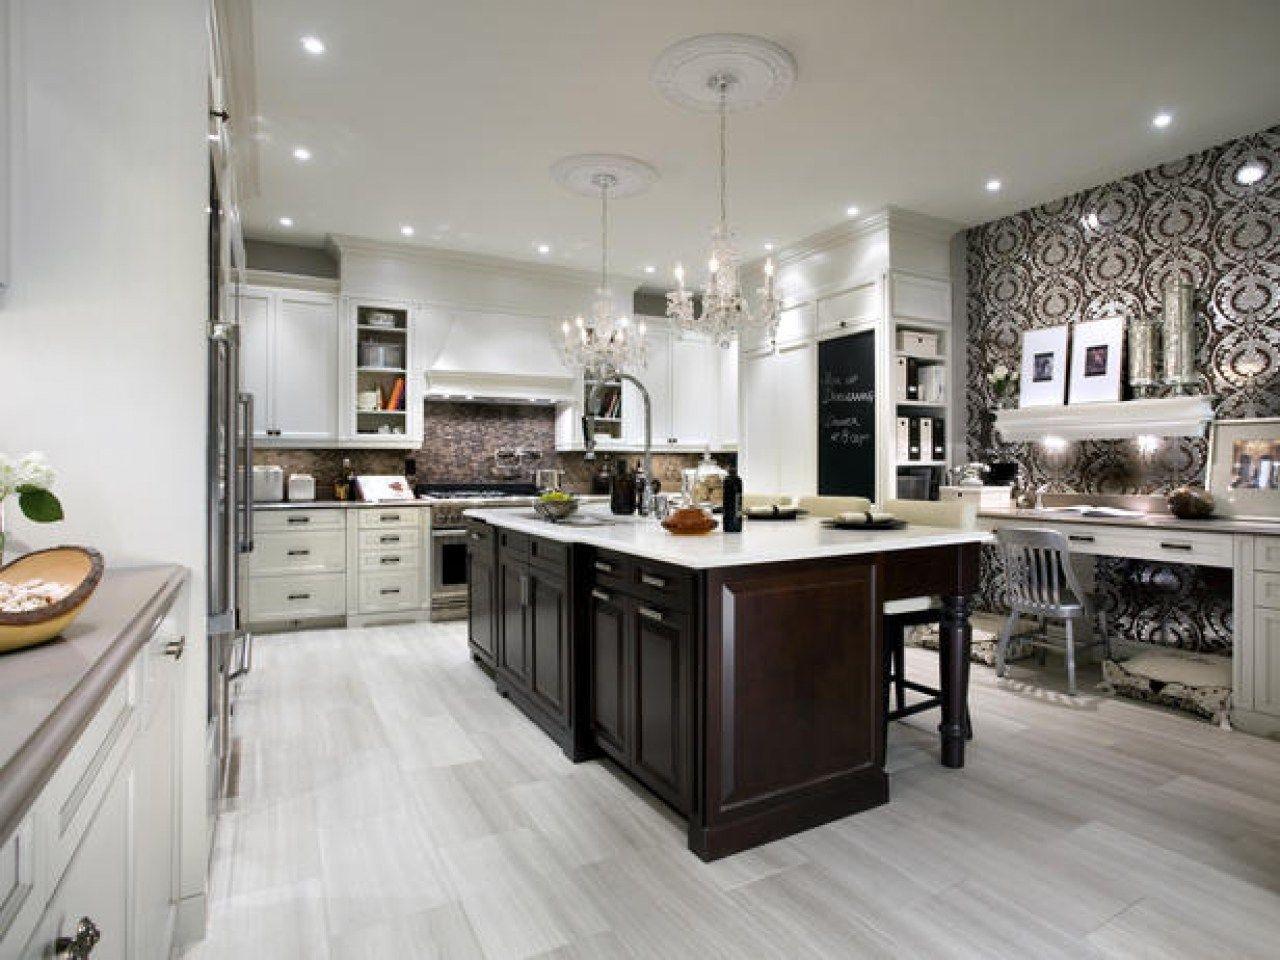 modern furniture candice olson inviting kitchen design ideas inviting kitchen designs candice olson kitchen ideas design